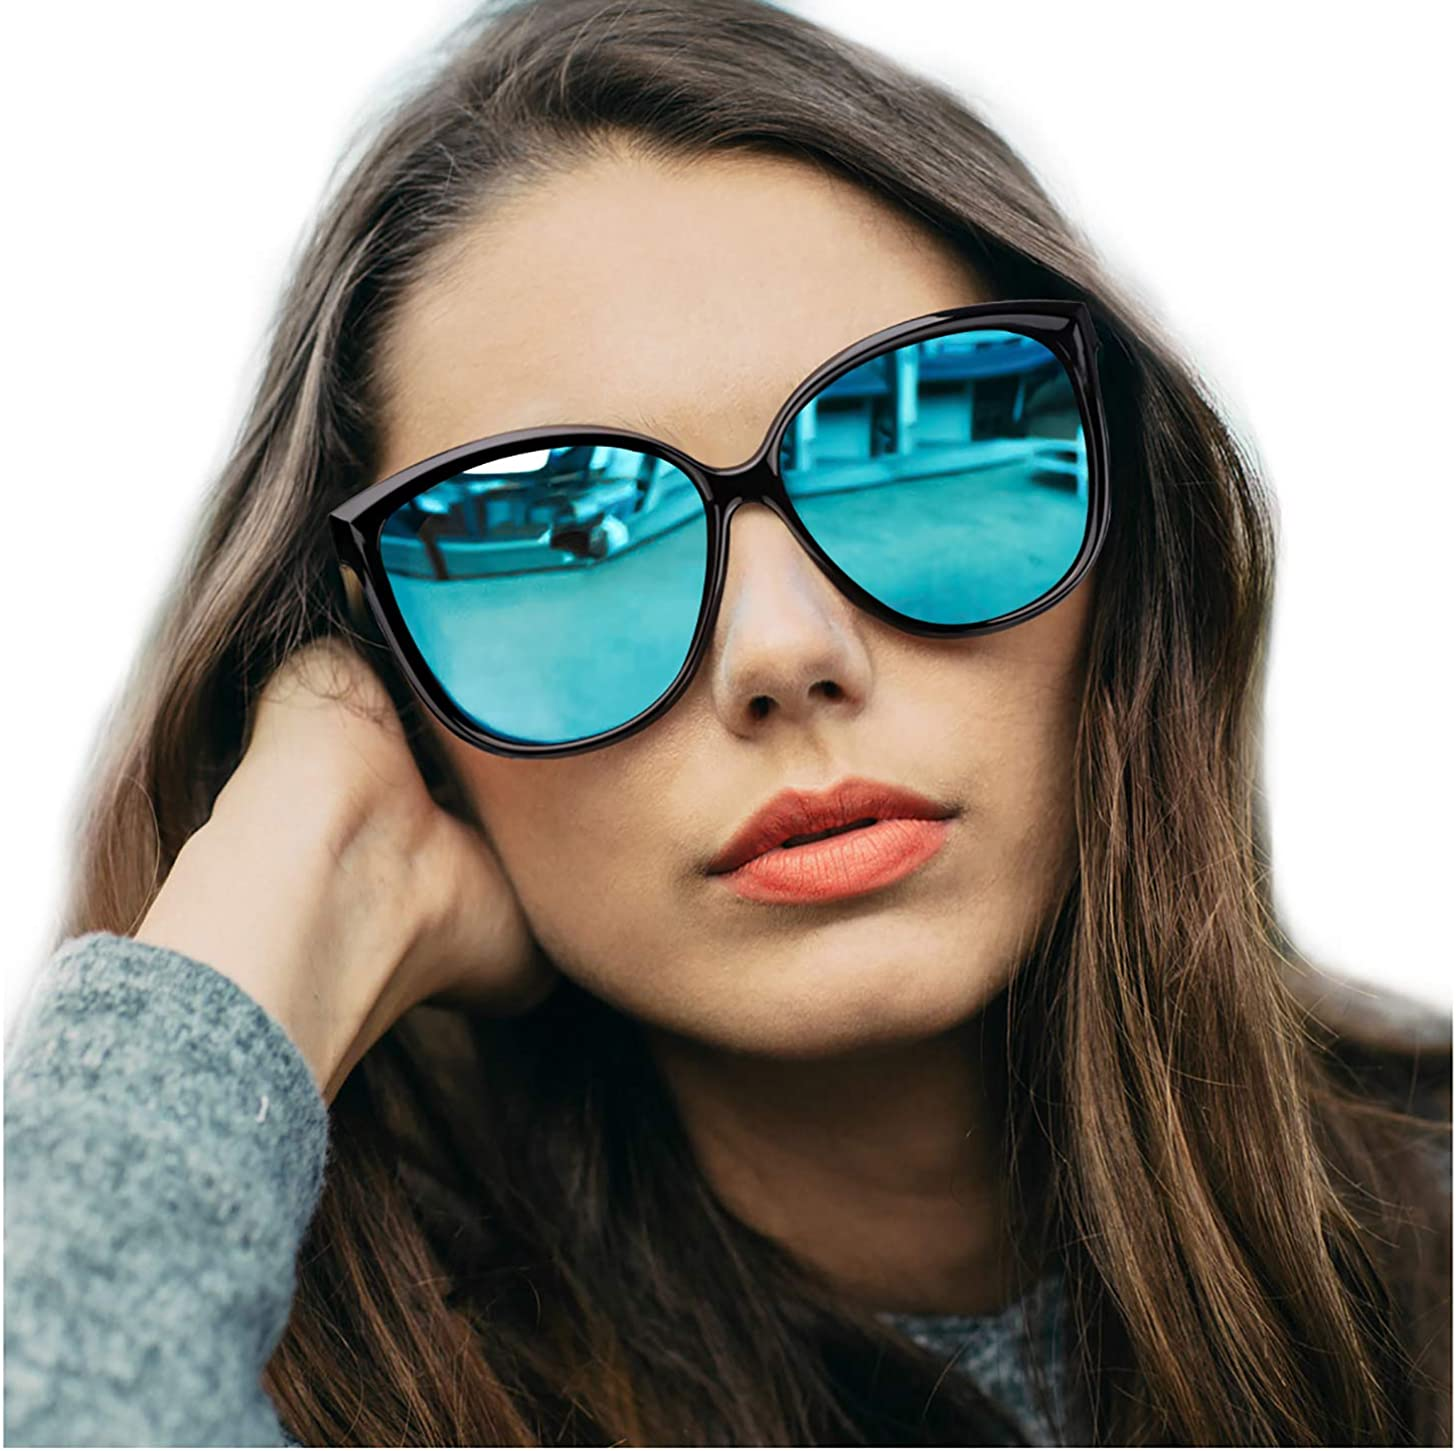 Sunglasses UV400 Women sun glasses//Eyewear Outdoor Cat Eye Blue Mirrored lens